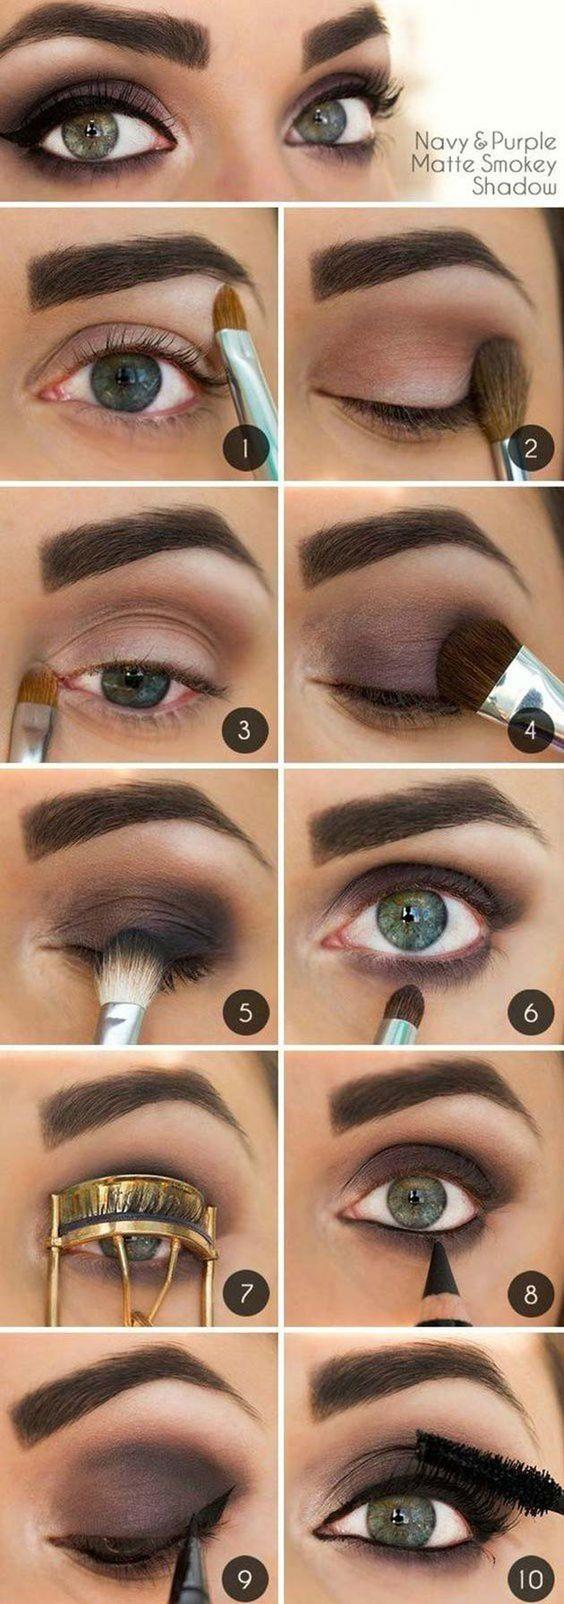 smokey eye makeup tips for green eyes | saubhaya makeup